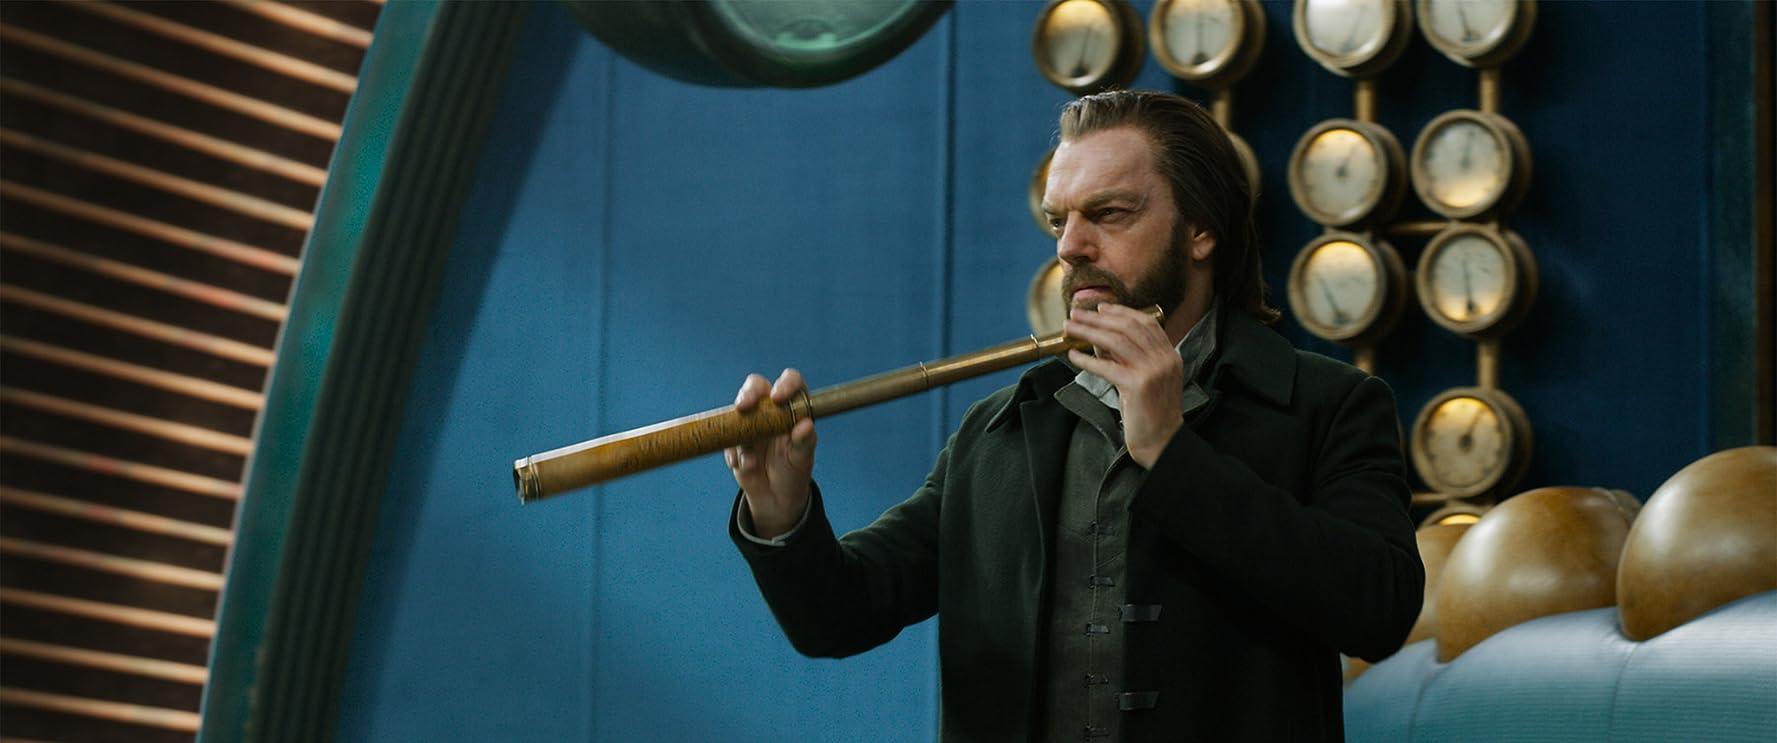 Hugo Weaving in Mortal Engines (2018)